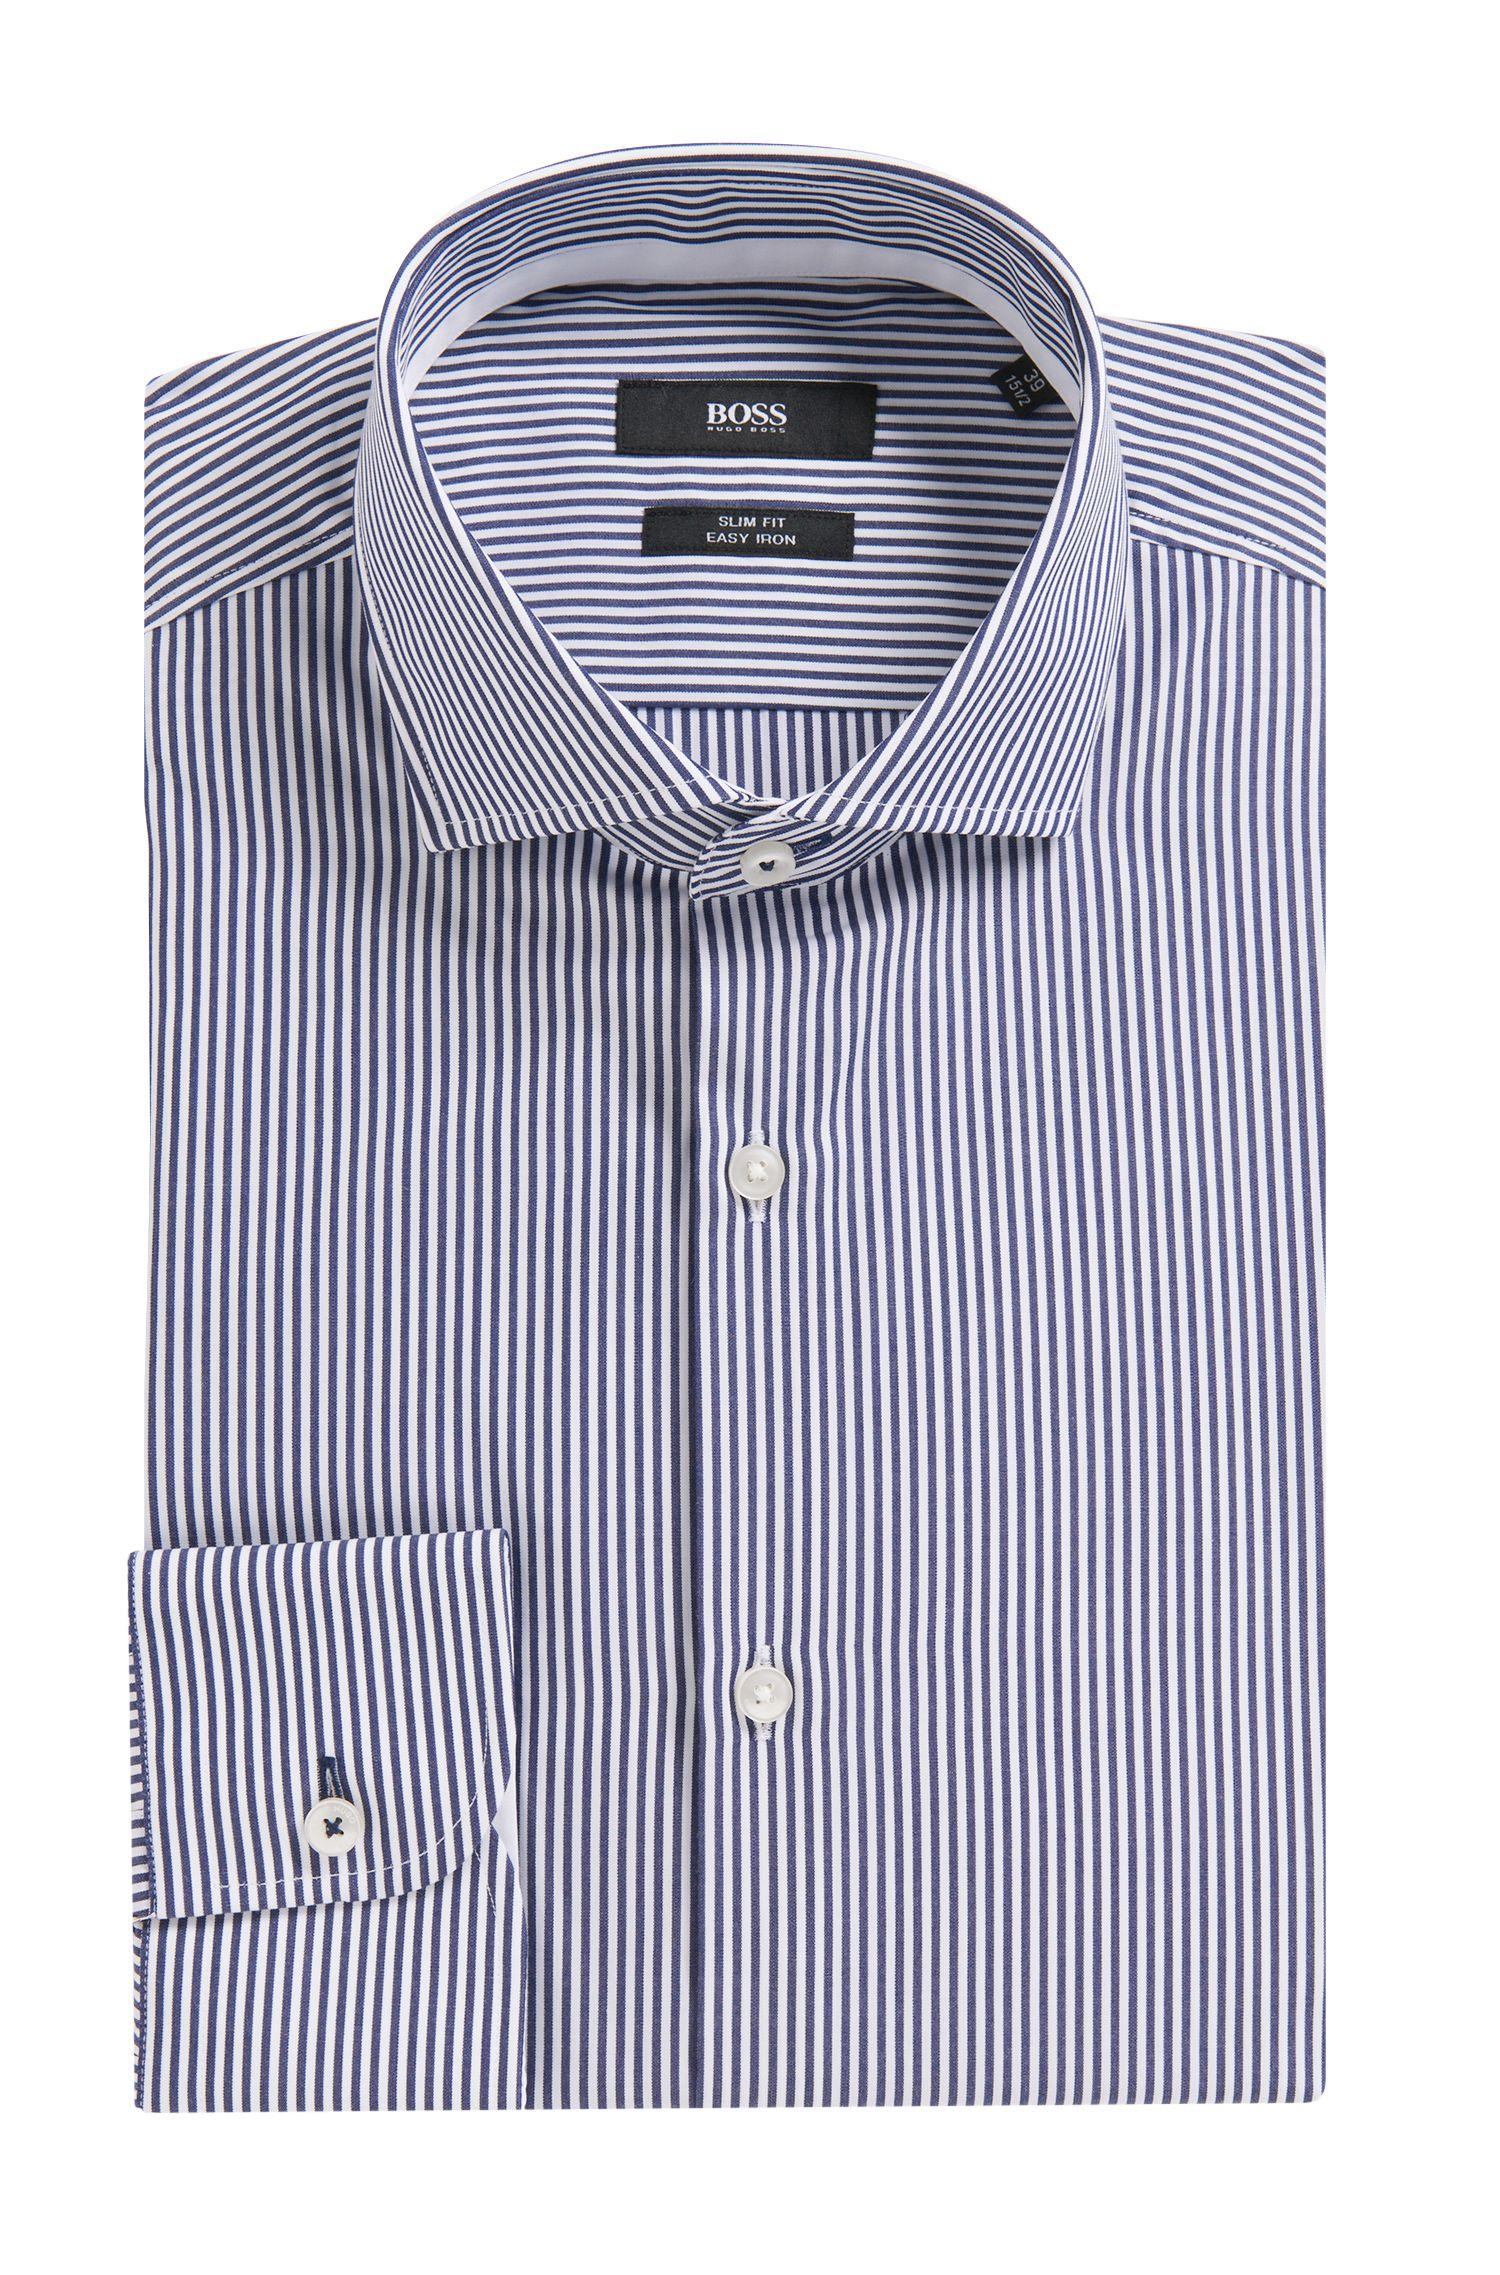 'Jery' | Slim Fit, Cotton Dress Shirt